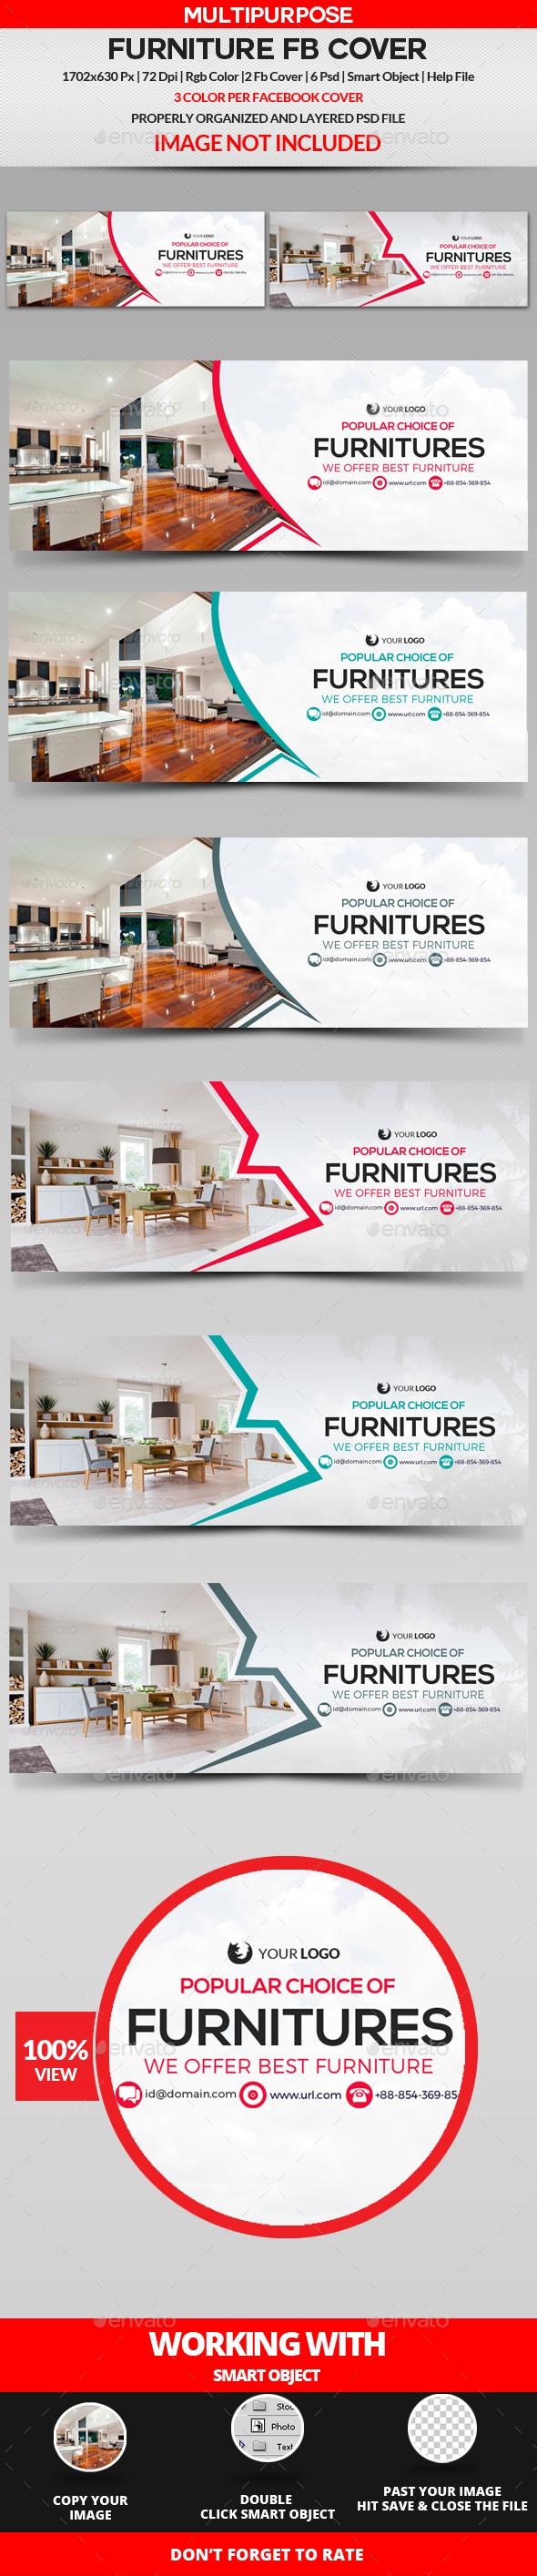 Furniture Facebook Cover  - Facebook Timeline Covers Social Media